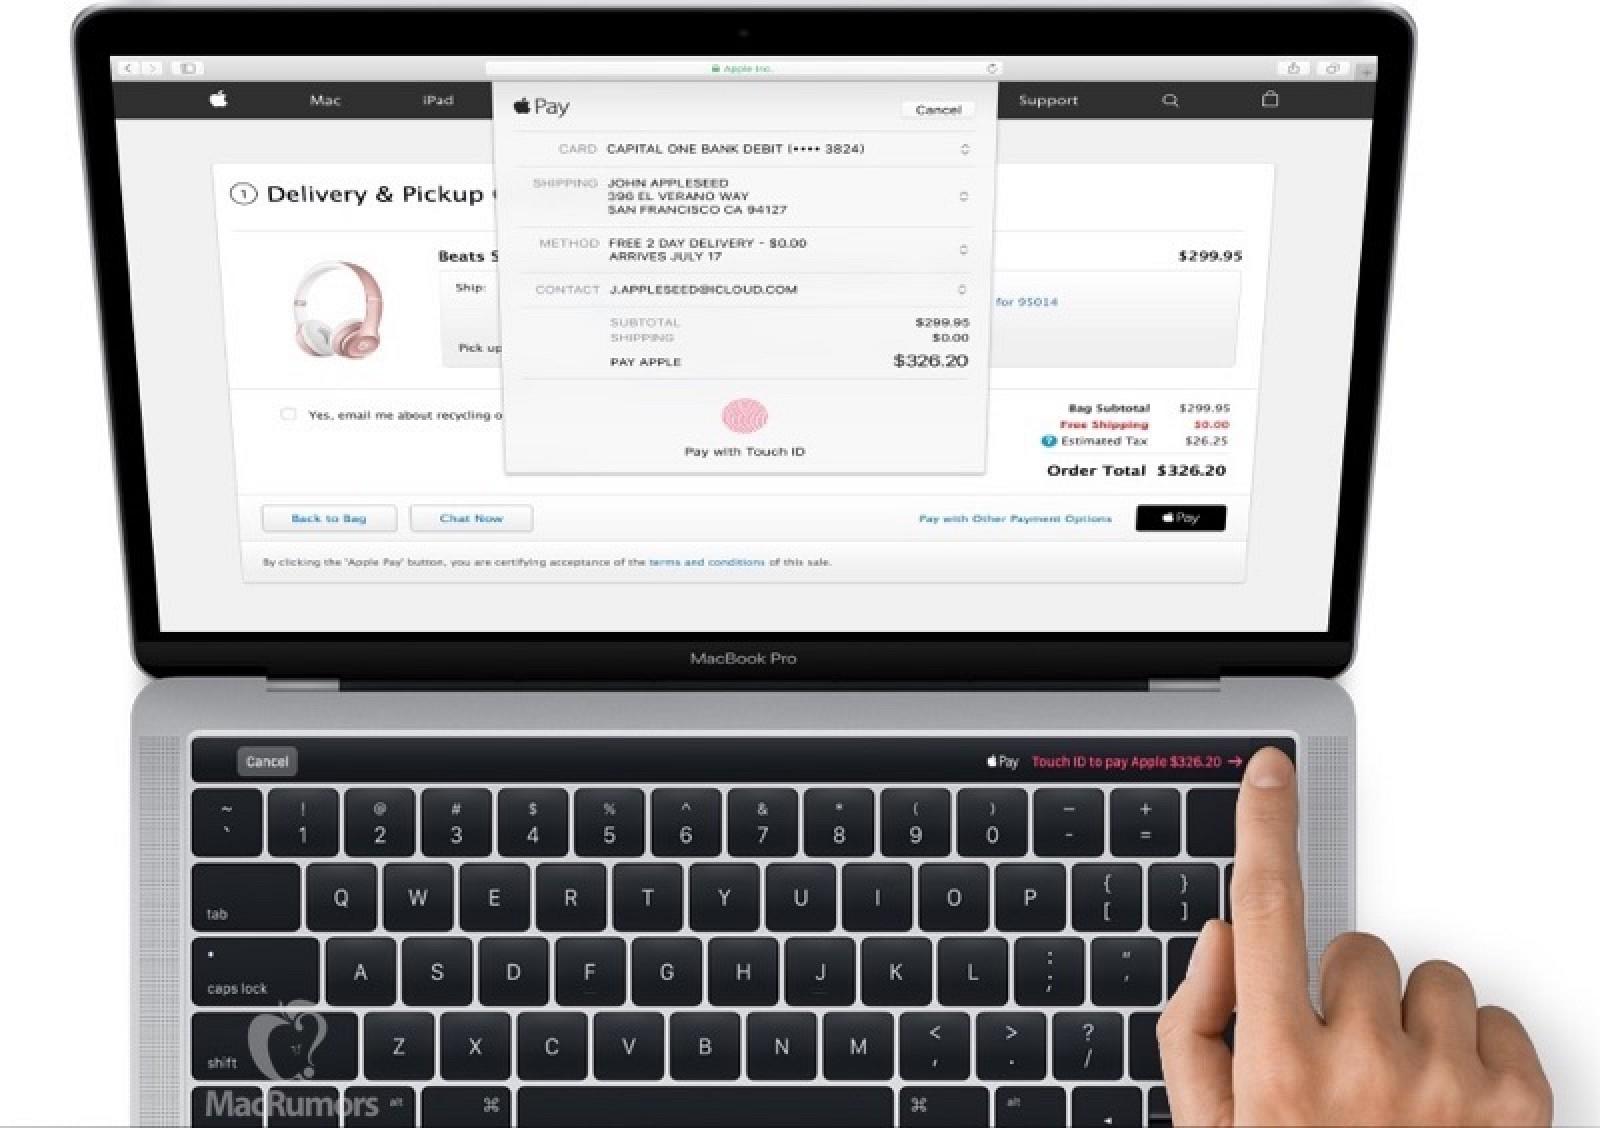 macbook bootcamp insert key